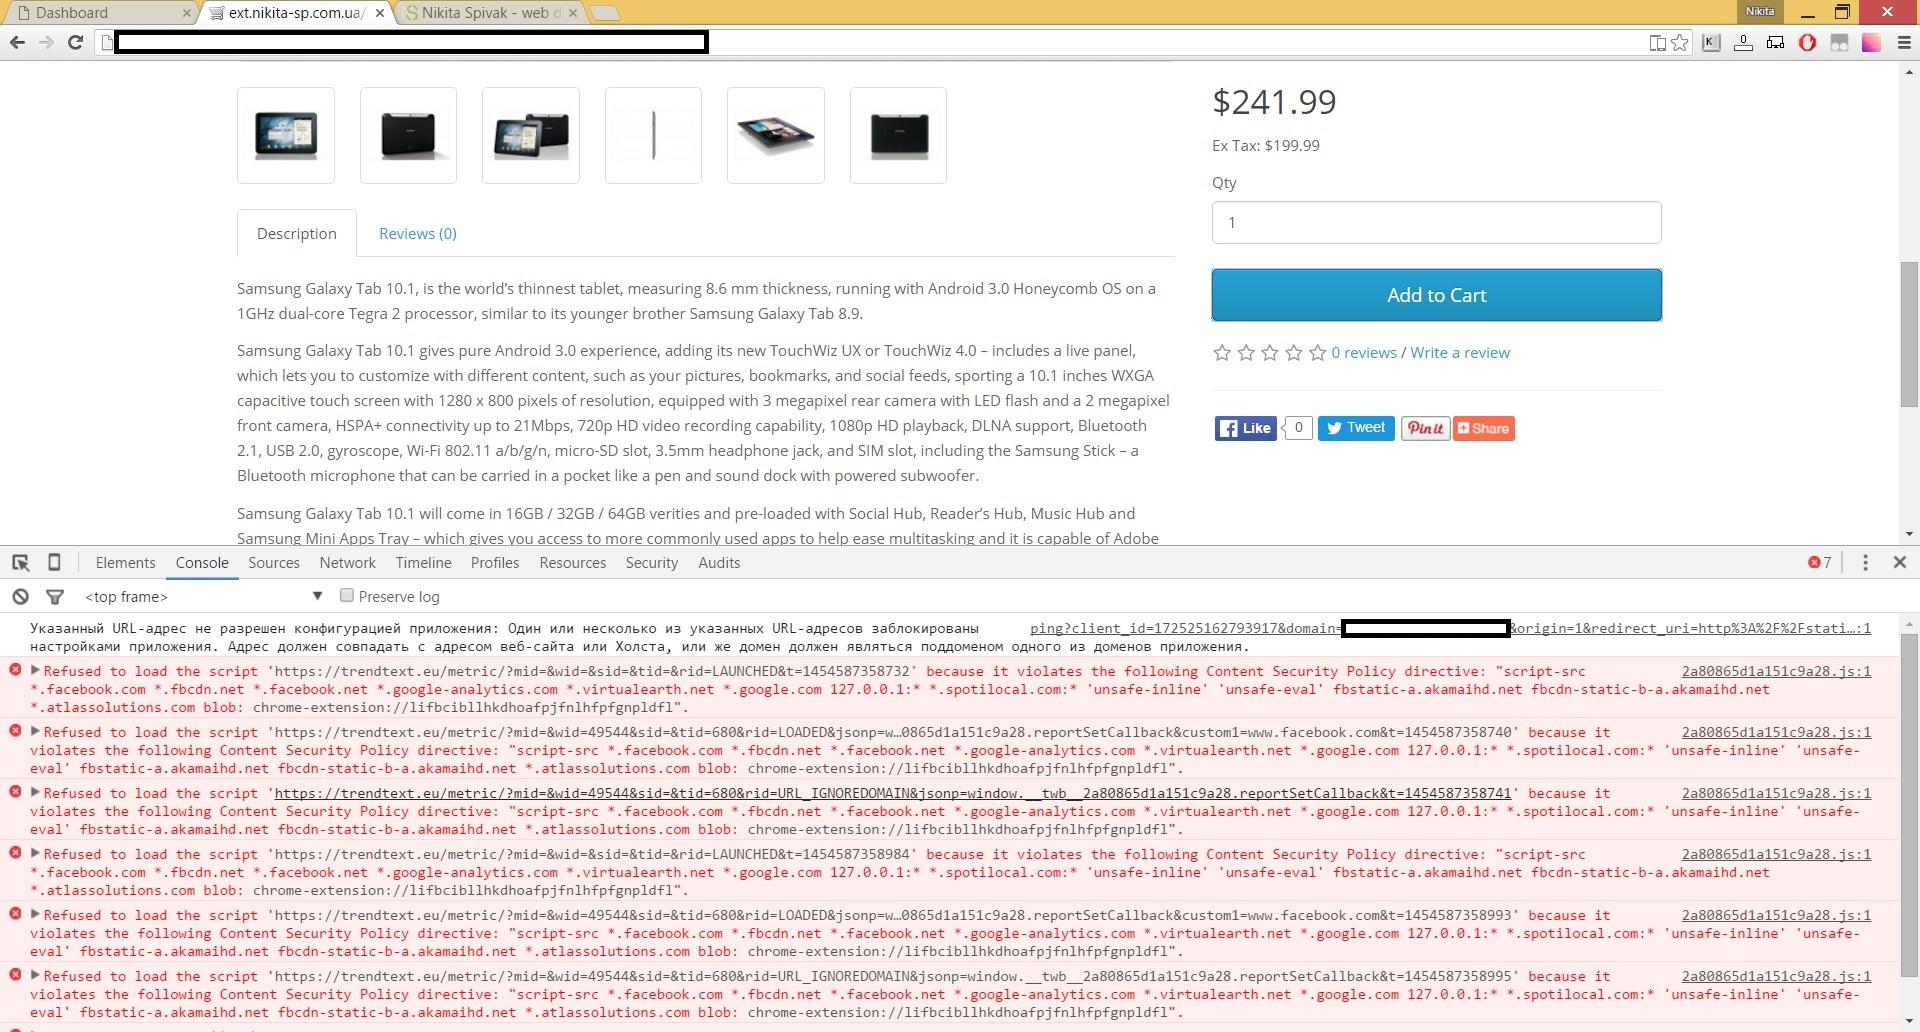 JavaScript не работает из-за вируса trendtext.eu в Chrome